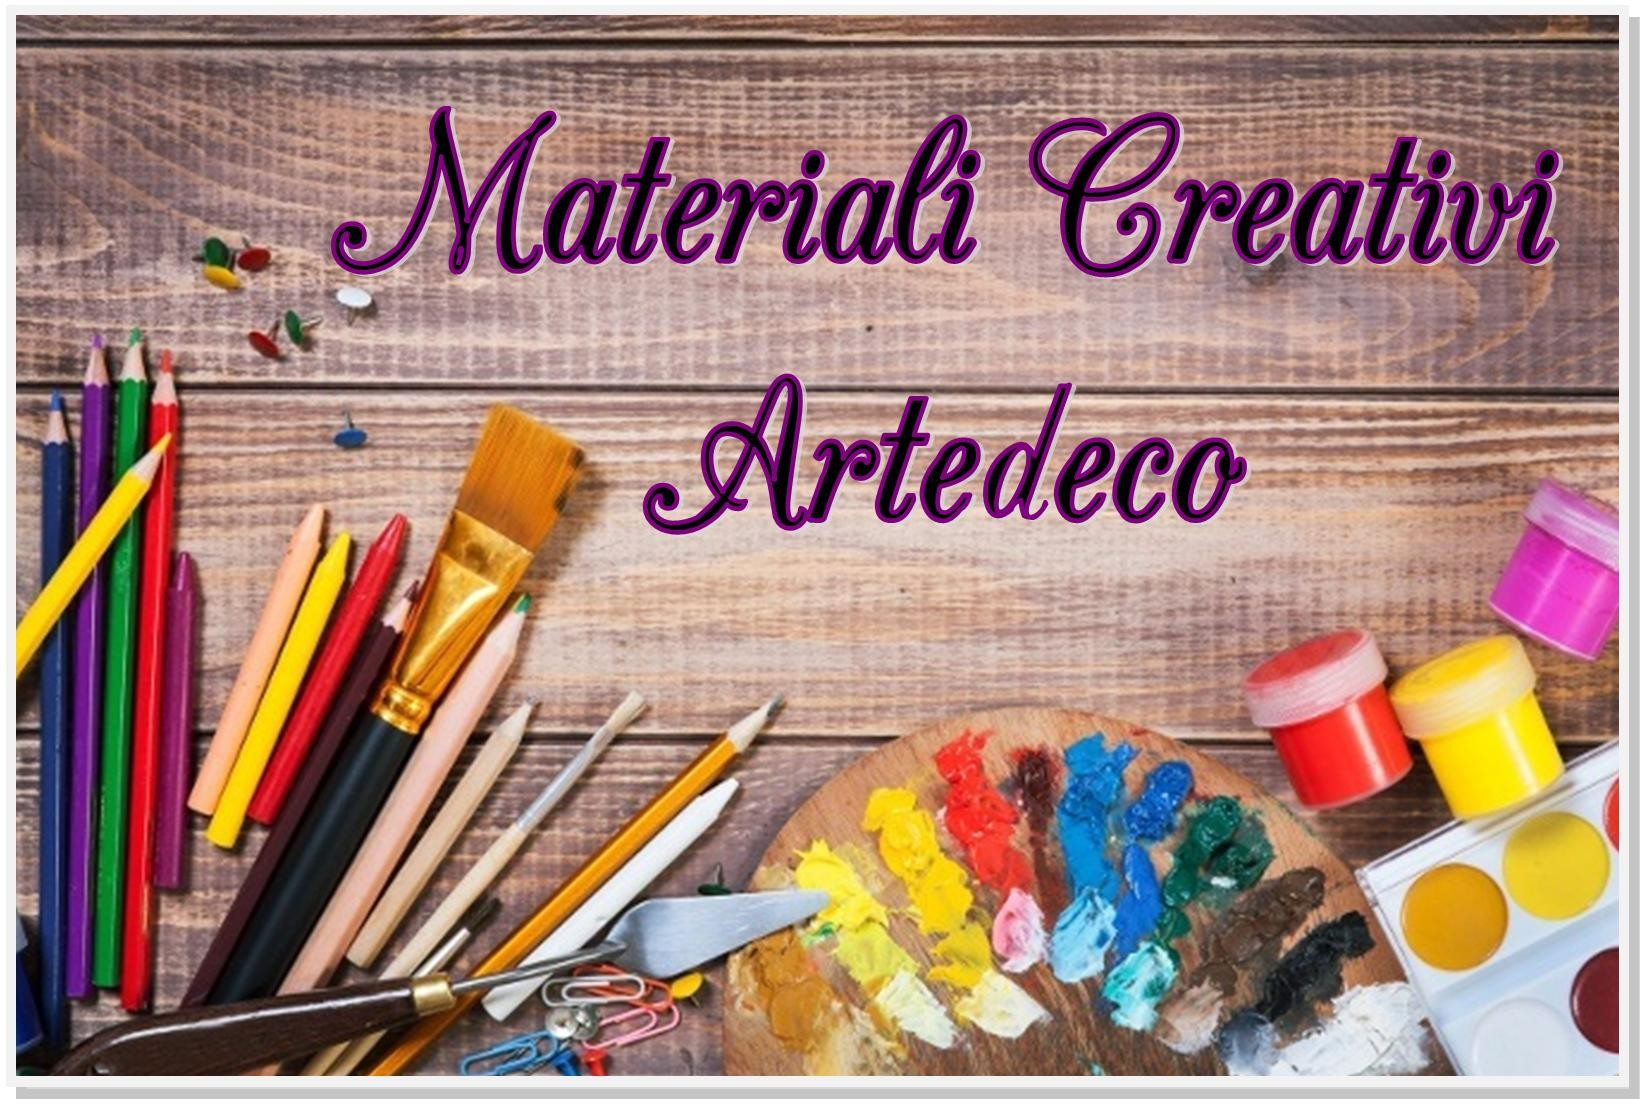 materiali creativi